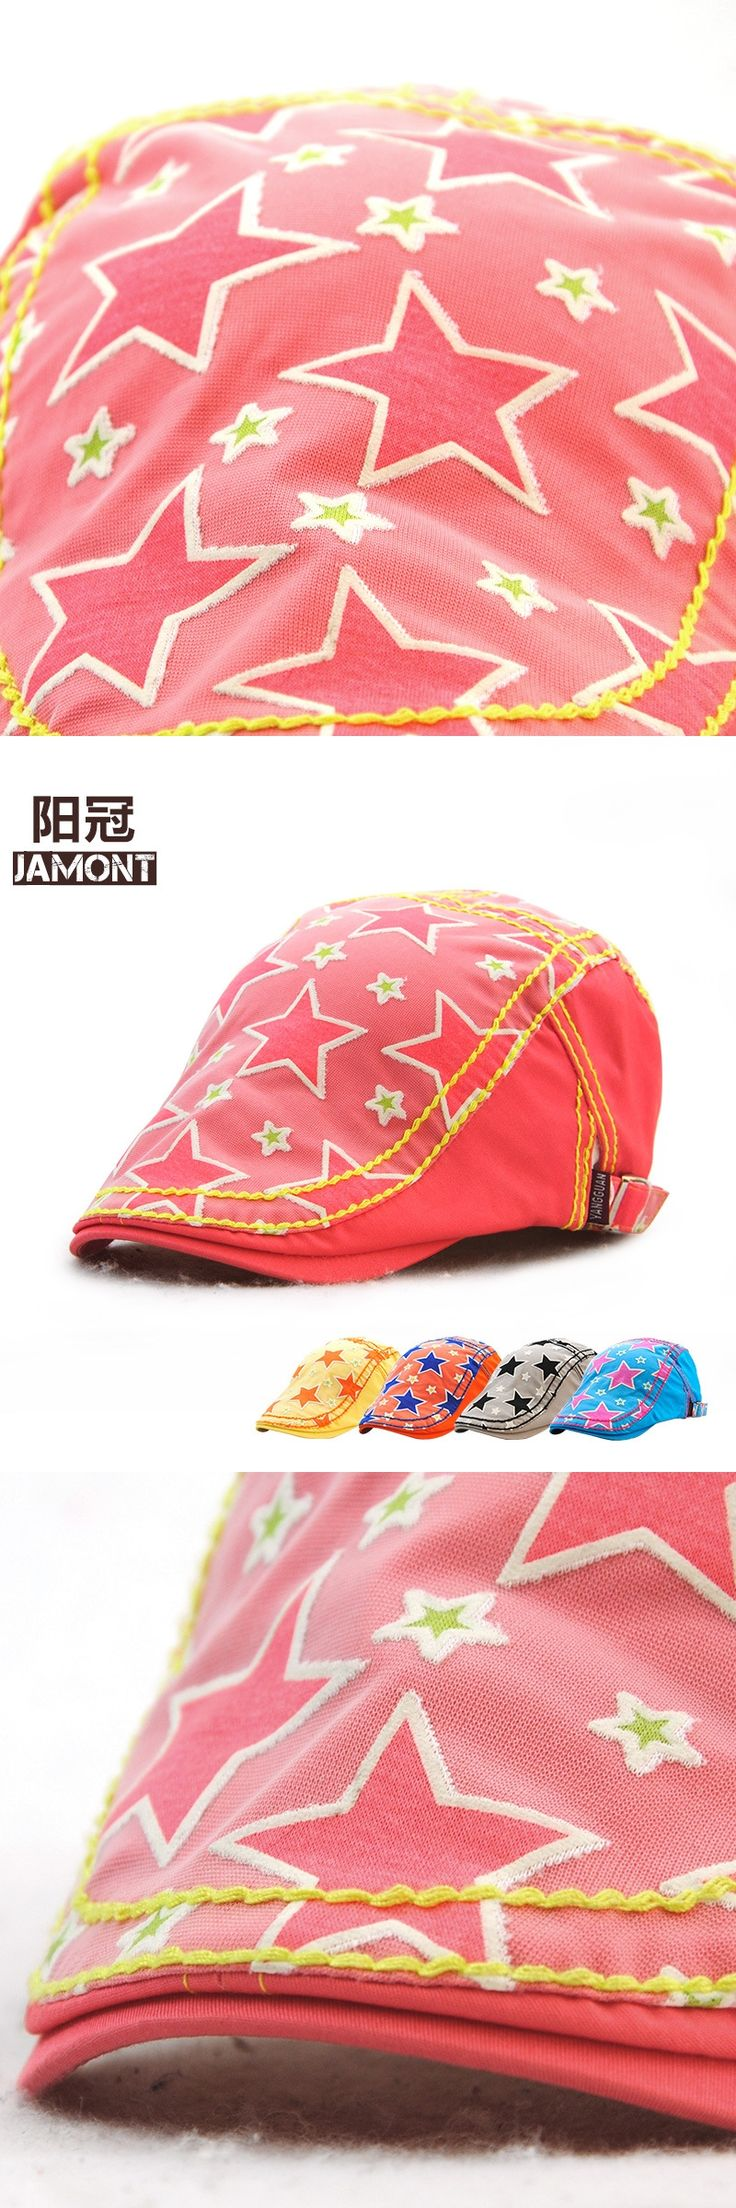 The spring and autumn children children star brand peaked cap hat hat cotton outdoor sunshade hat wholesale